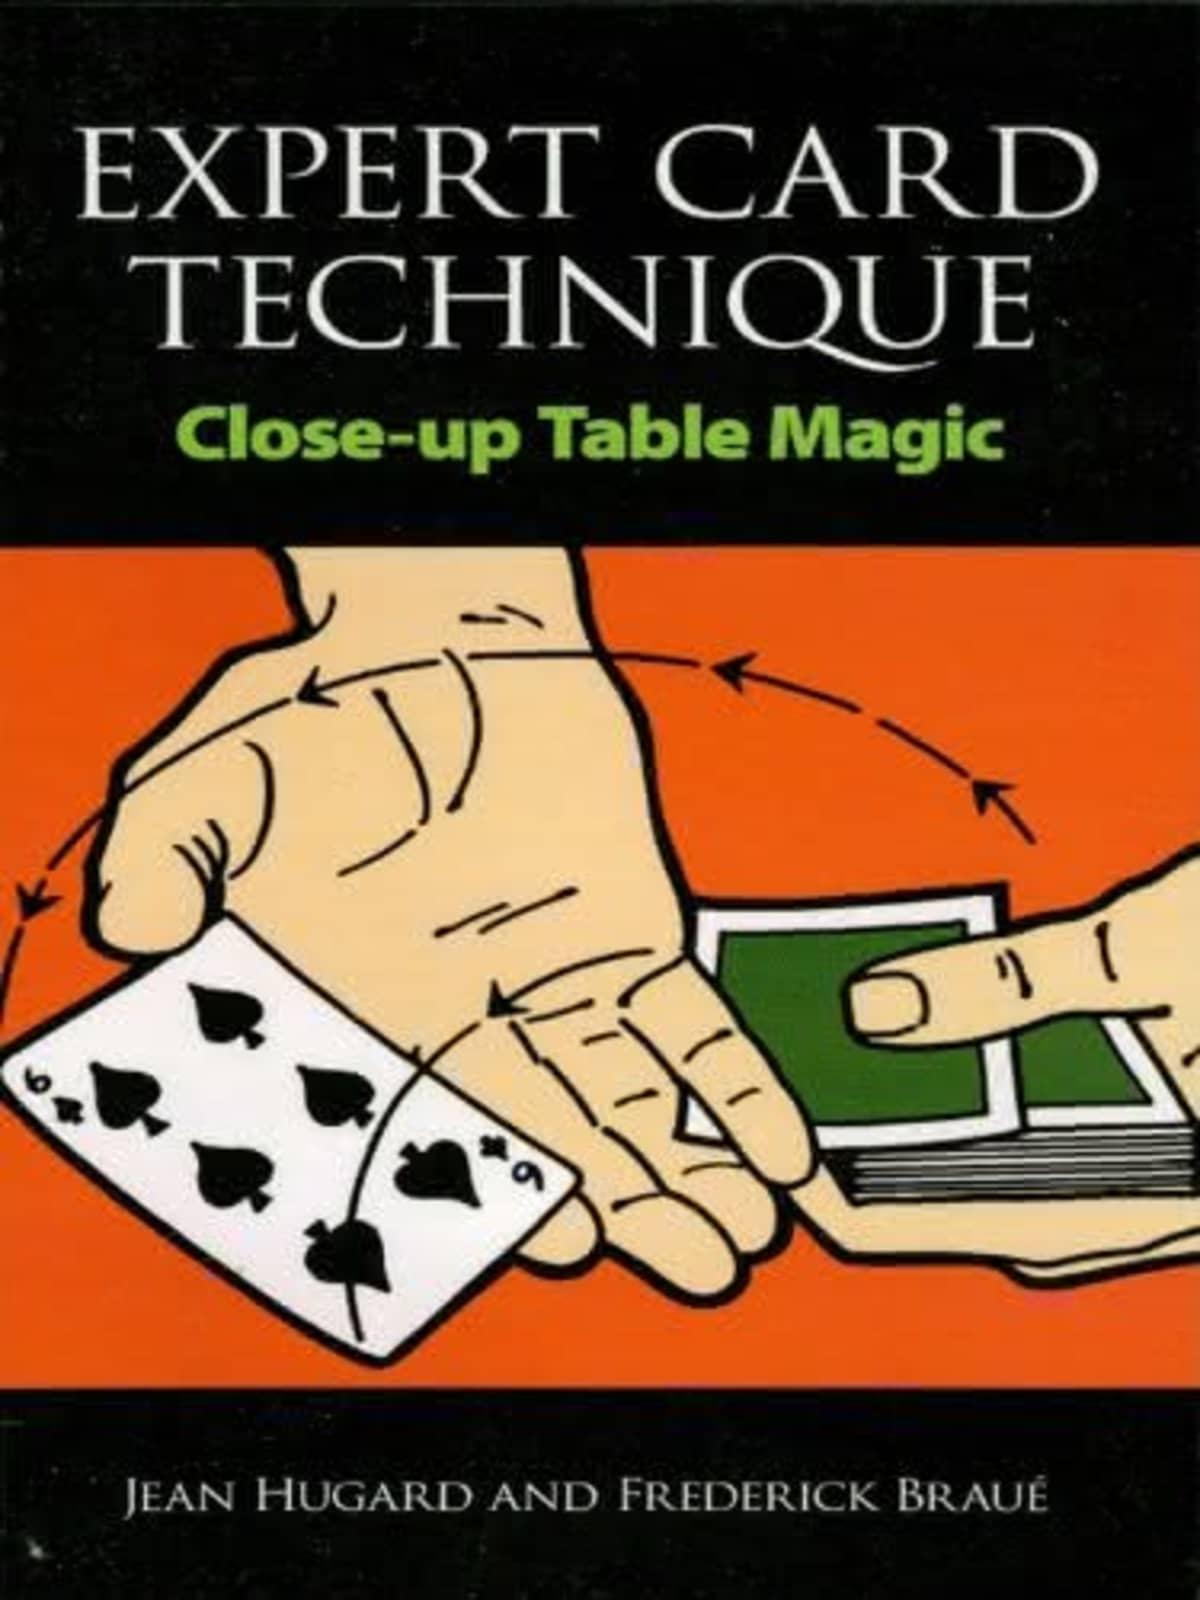 Book-Expert Card Technique Close up. Images